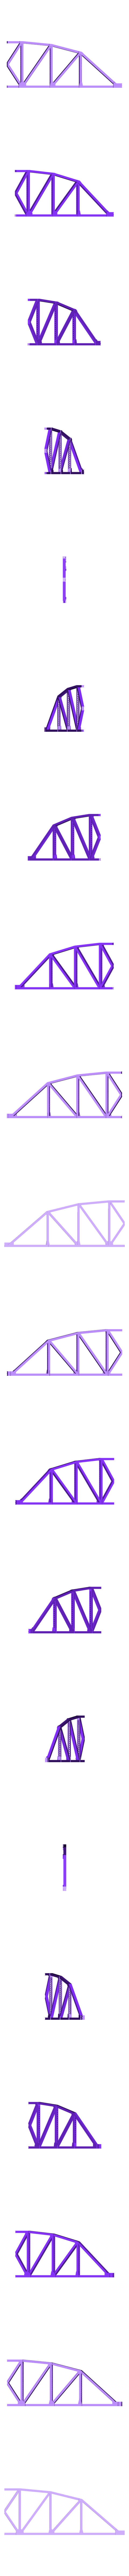 RH_Main_Truss_Section.stl Download free STL file HO Scale 145 ft Steel Arched Truss Bridge • 3D printer model, kabrumble